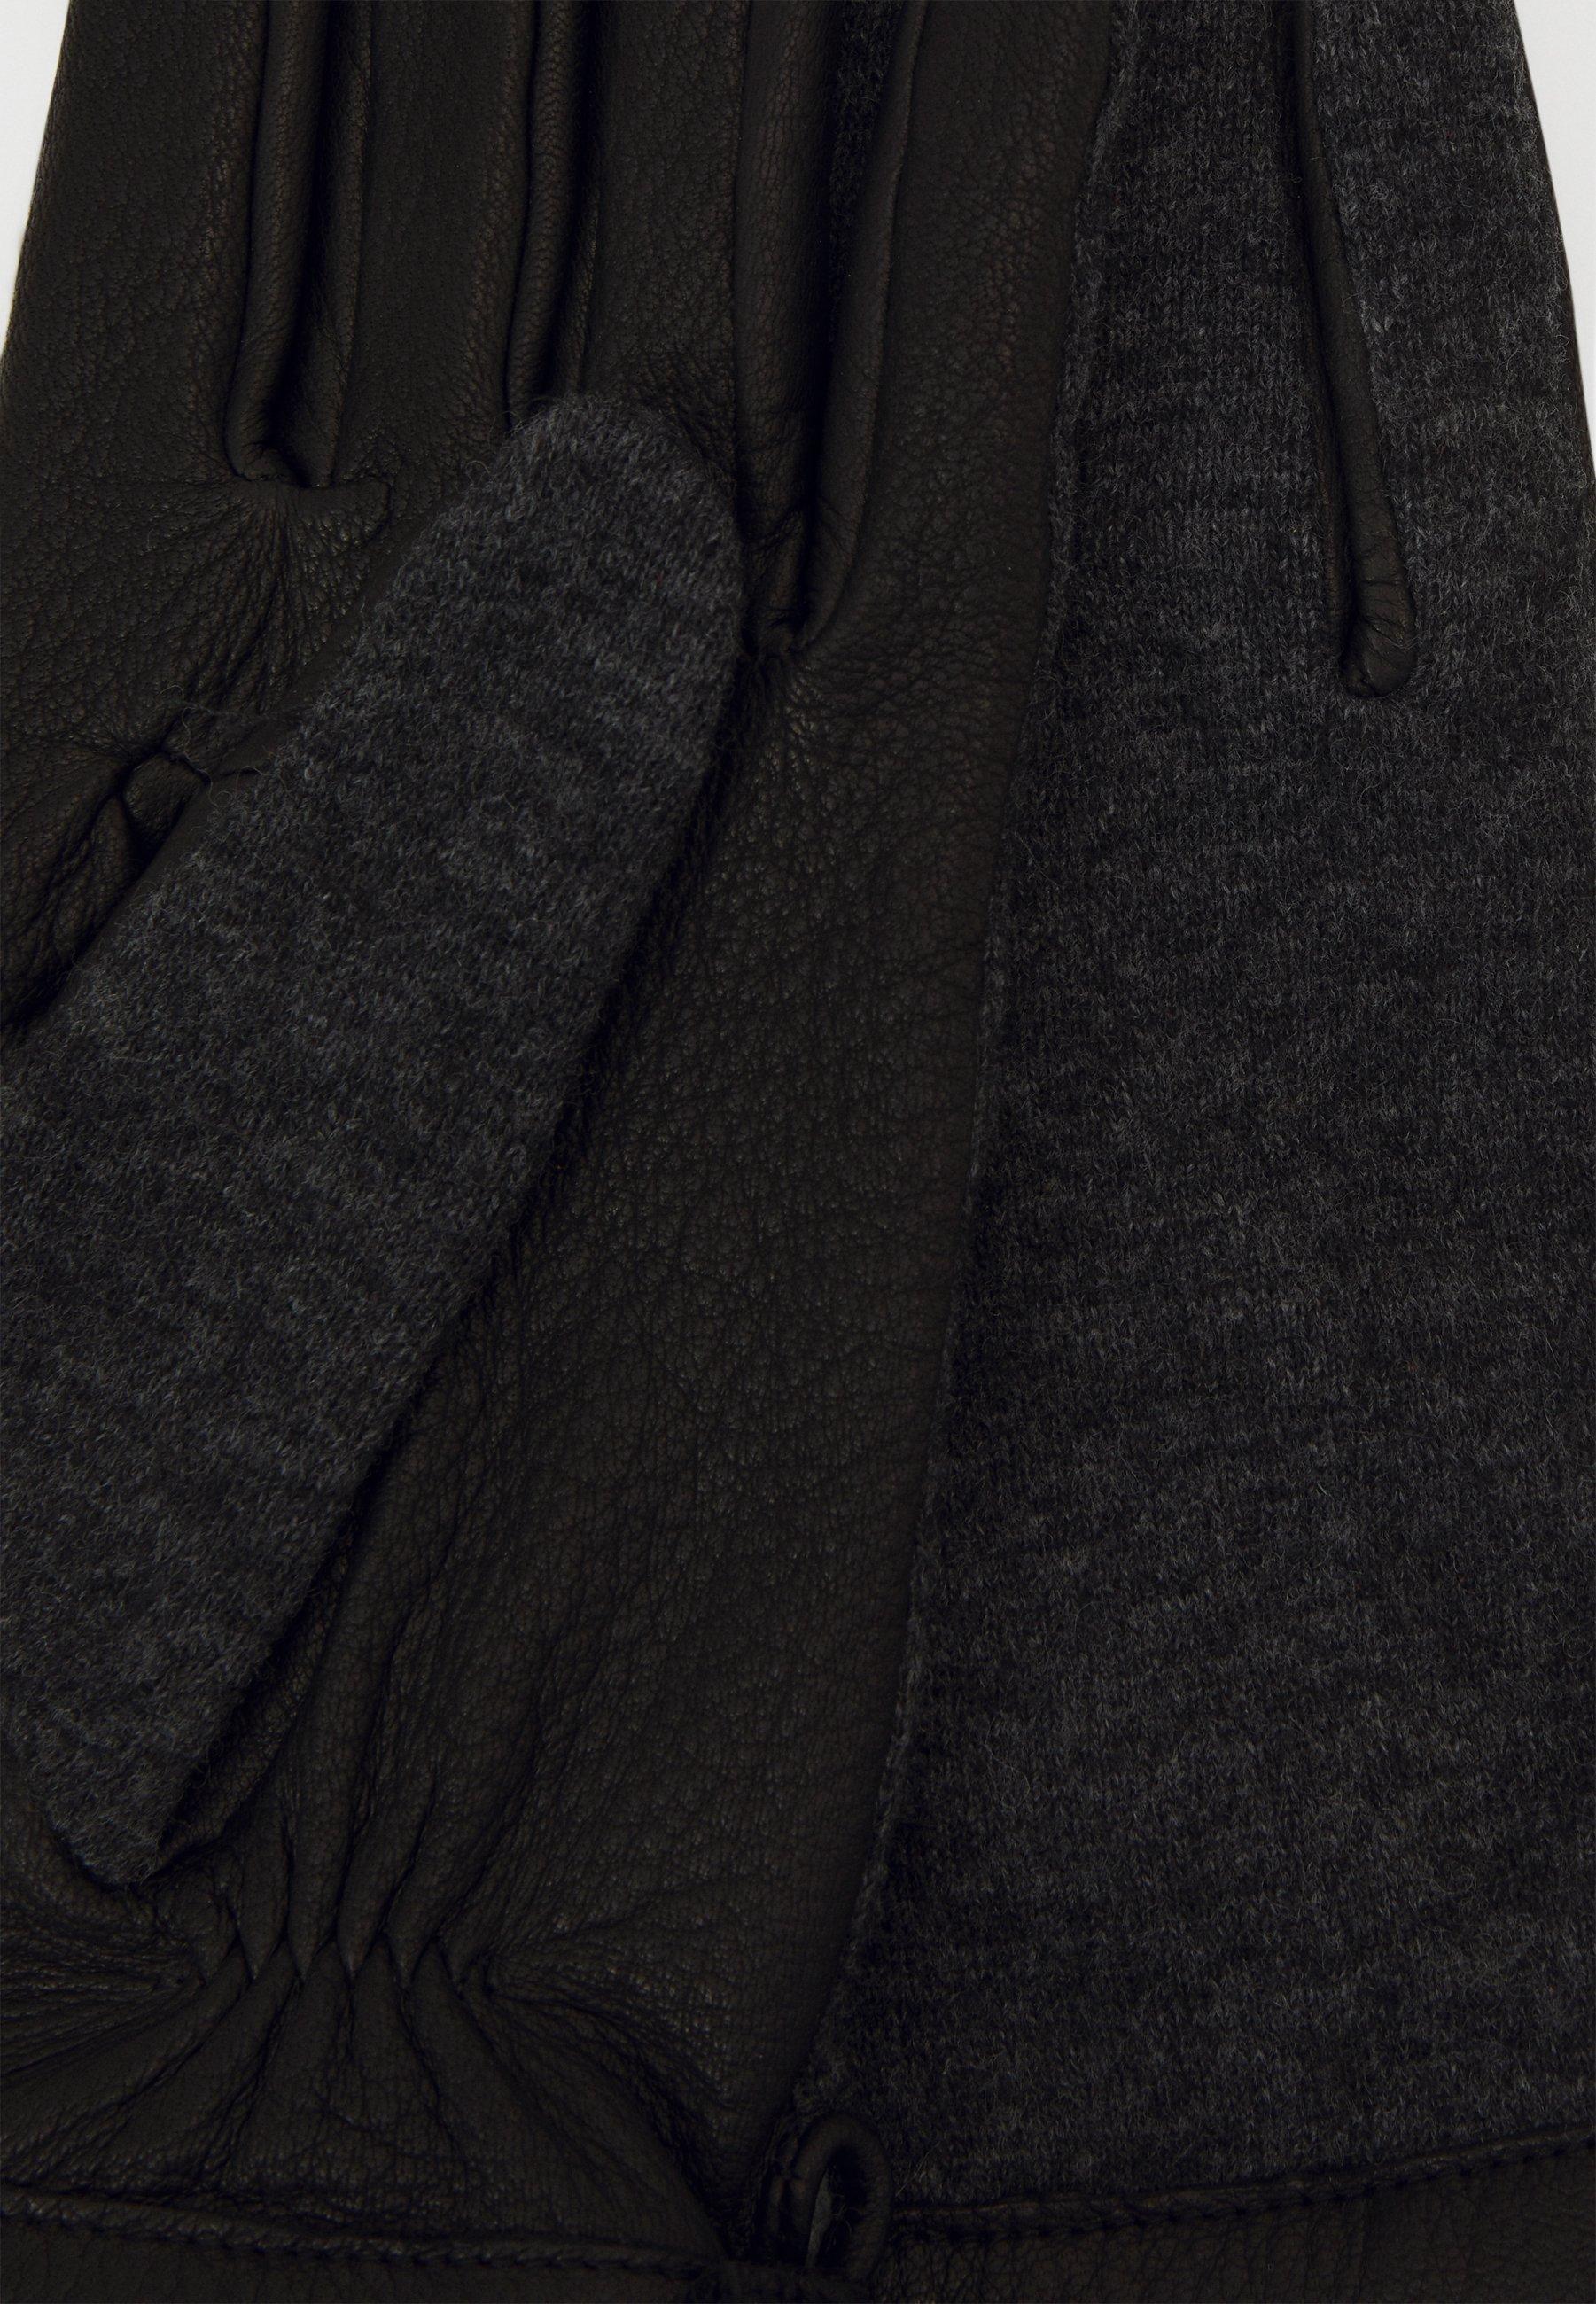 Otto Kessler Hansker - black/dark grey/svart bHWxy2QF5L3yt1I